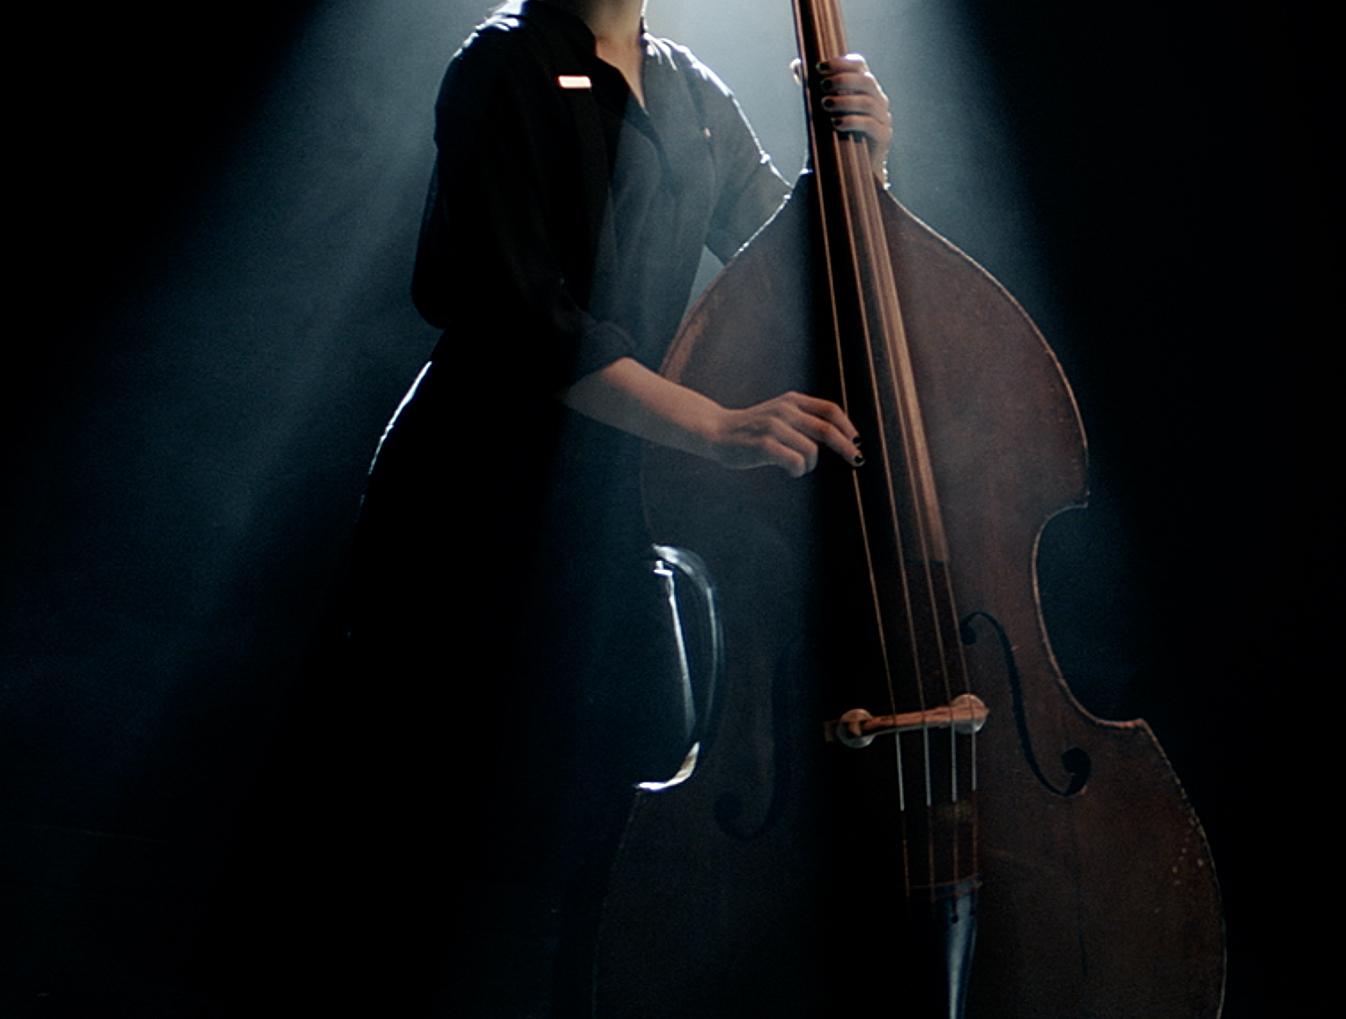 double_bass_4x